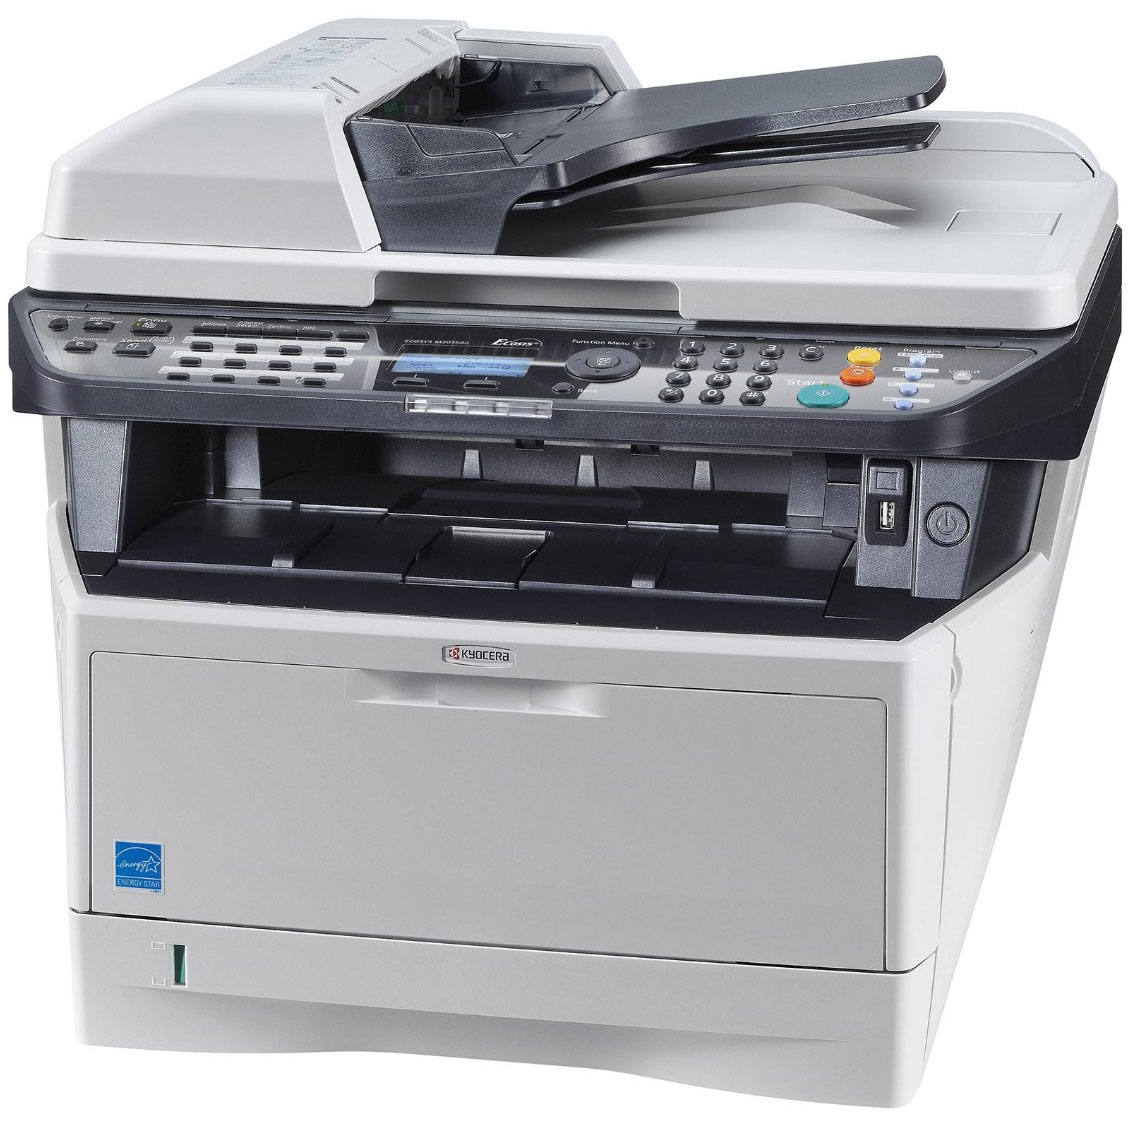 Kyocera M2035DN Printer, Copier, Scan : M2035 Discontinued M2035DN